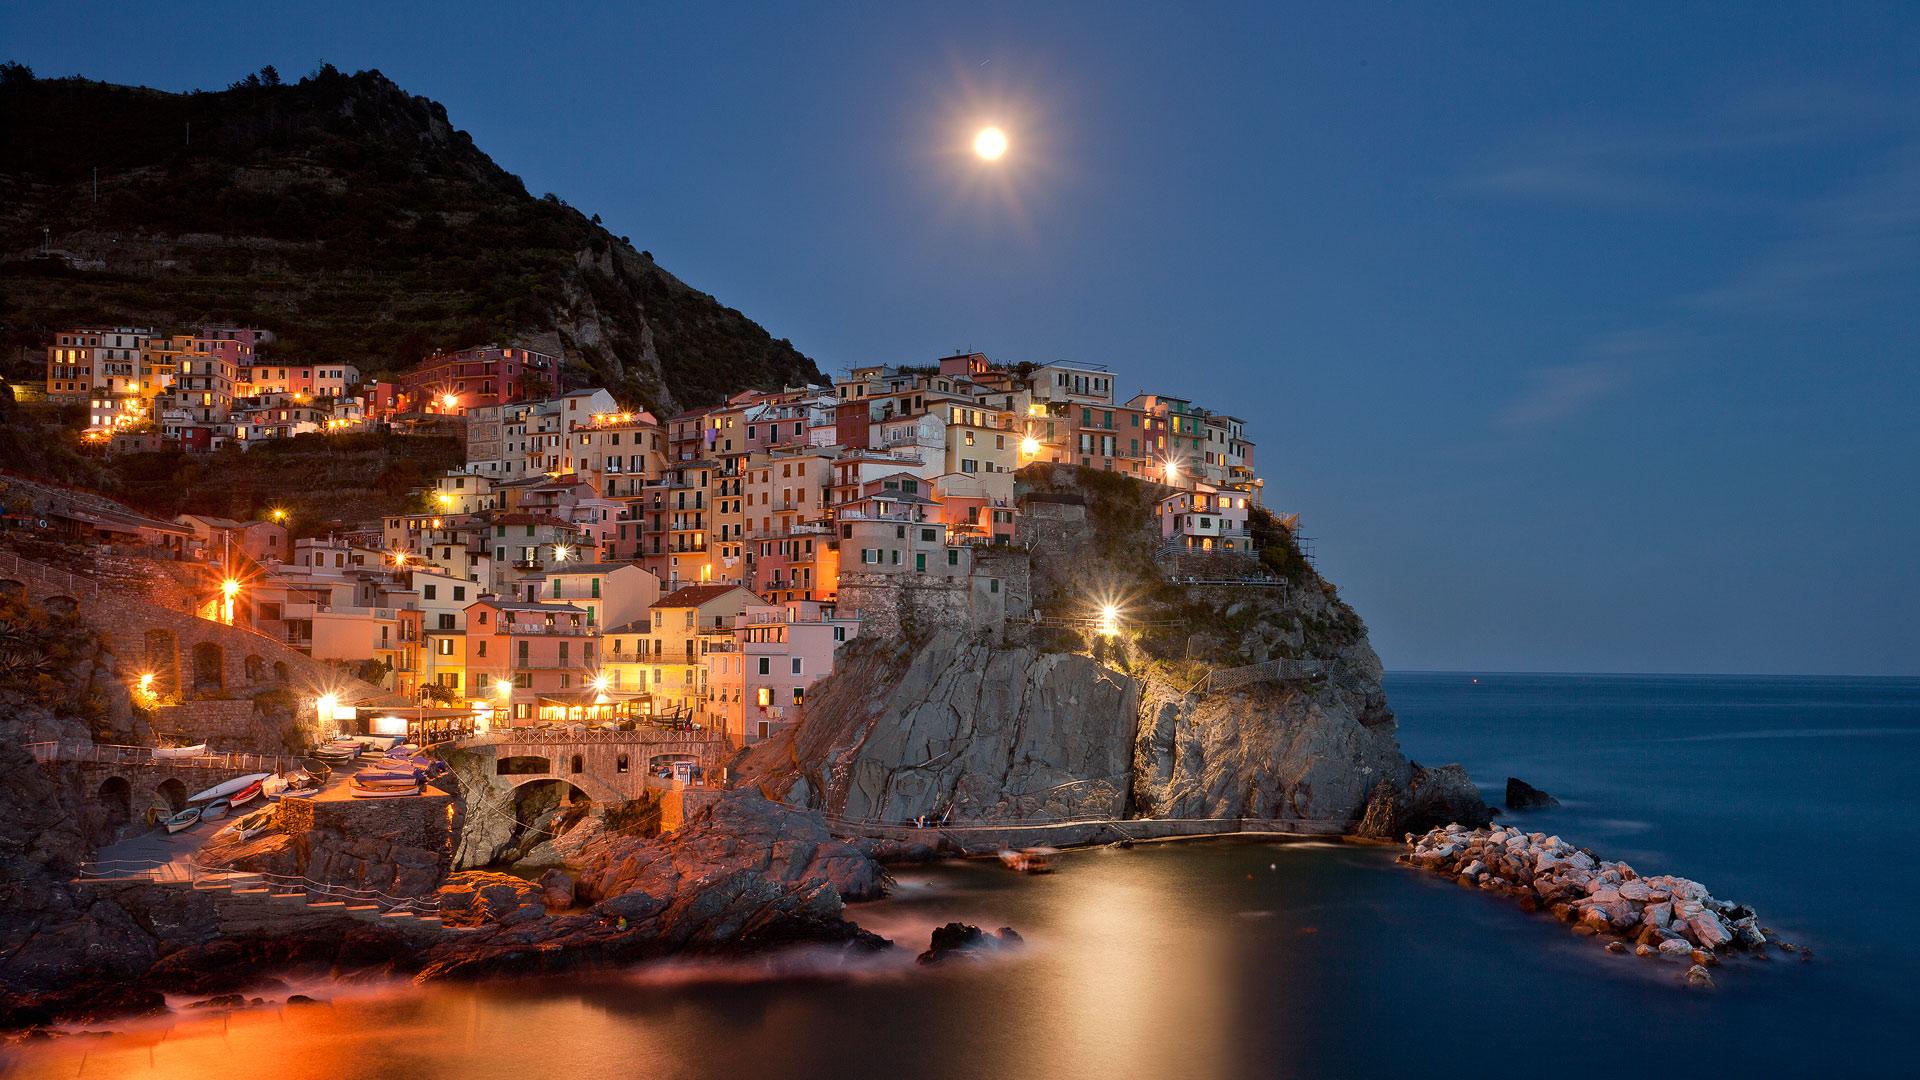 Manarola village from the famous Cinque Terre on the Italian Riviera